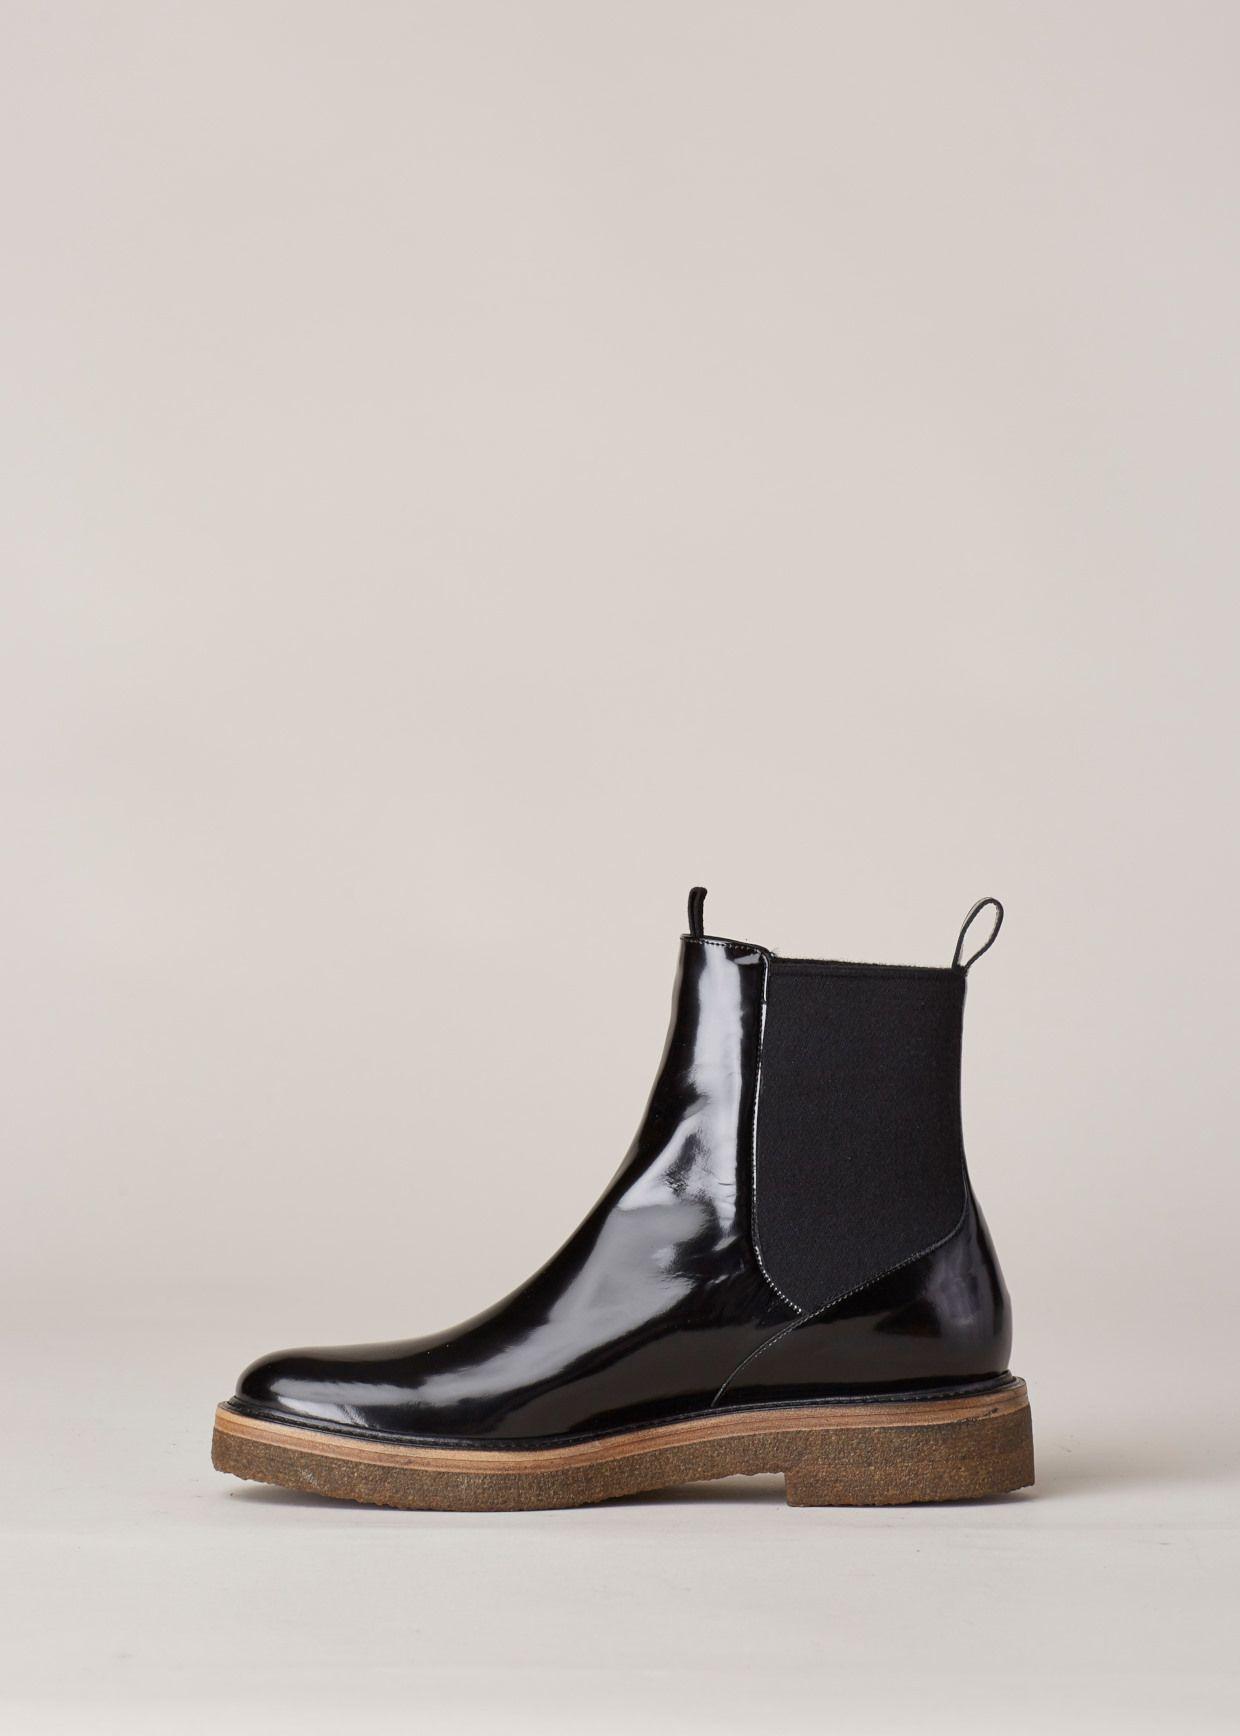 d94ab027729 Totokaelo - Dries Van Noten Gloss Black Pull On Chelsea Boot